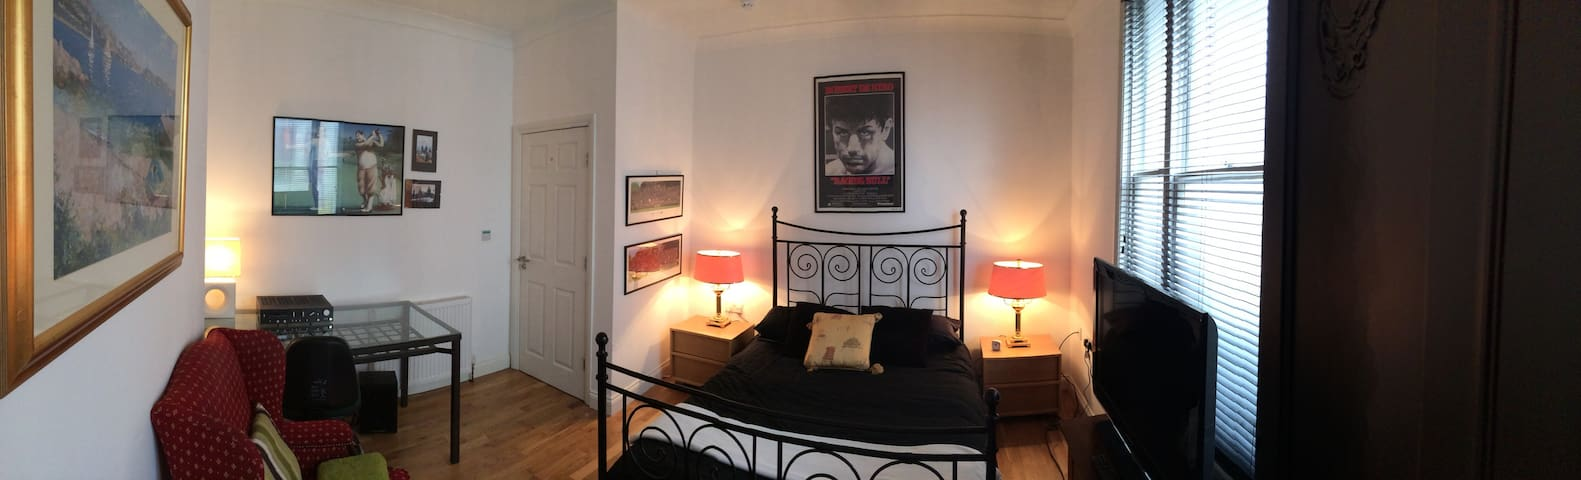 Luxury Room near the Sea in Saint Leonards 001 - Saint Leonards